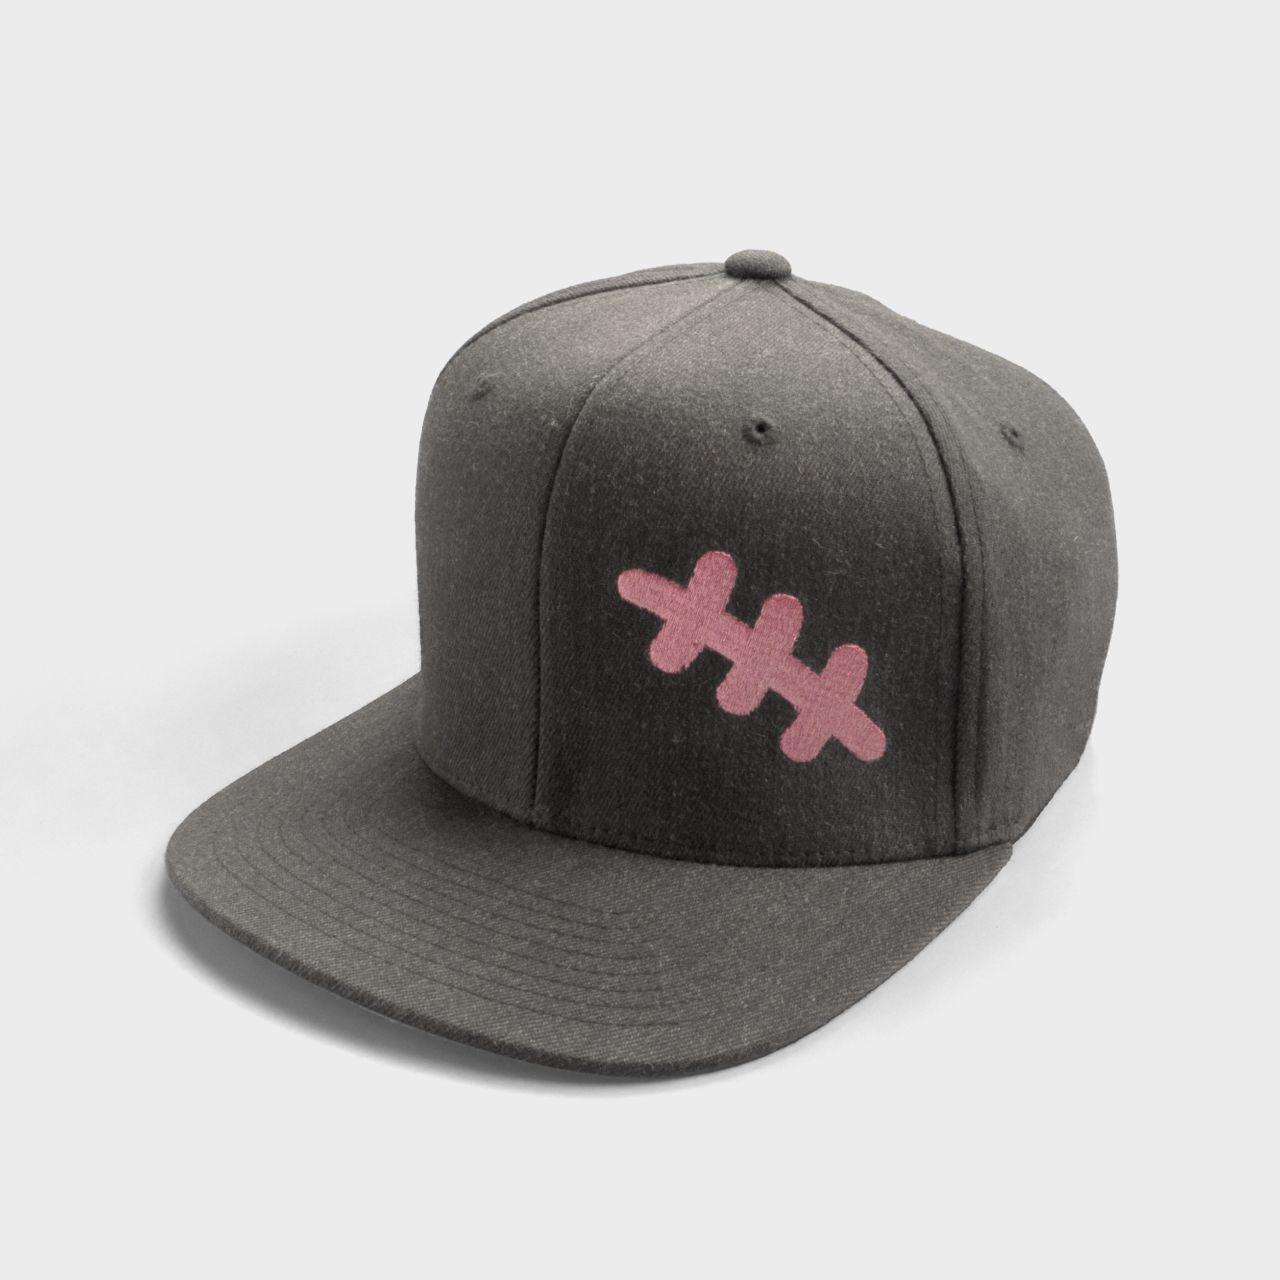 22262e81657 Scar Cap Grey ( Flexfit Pro-Style Wool ) - 83% Acrylic